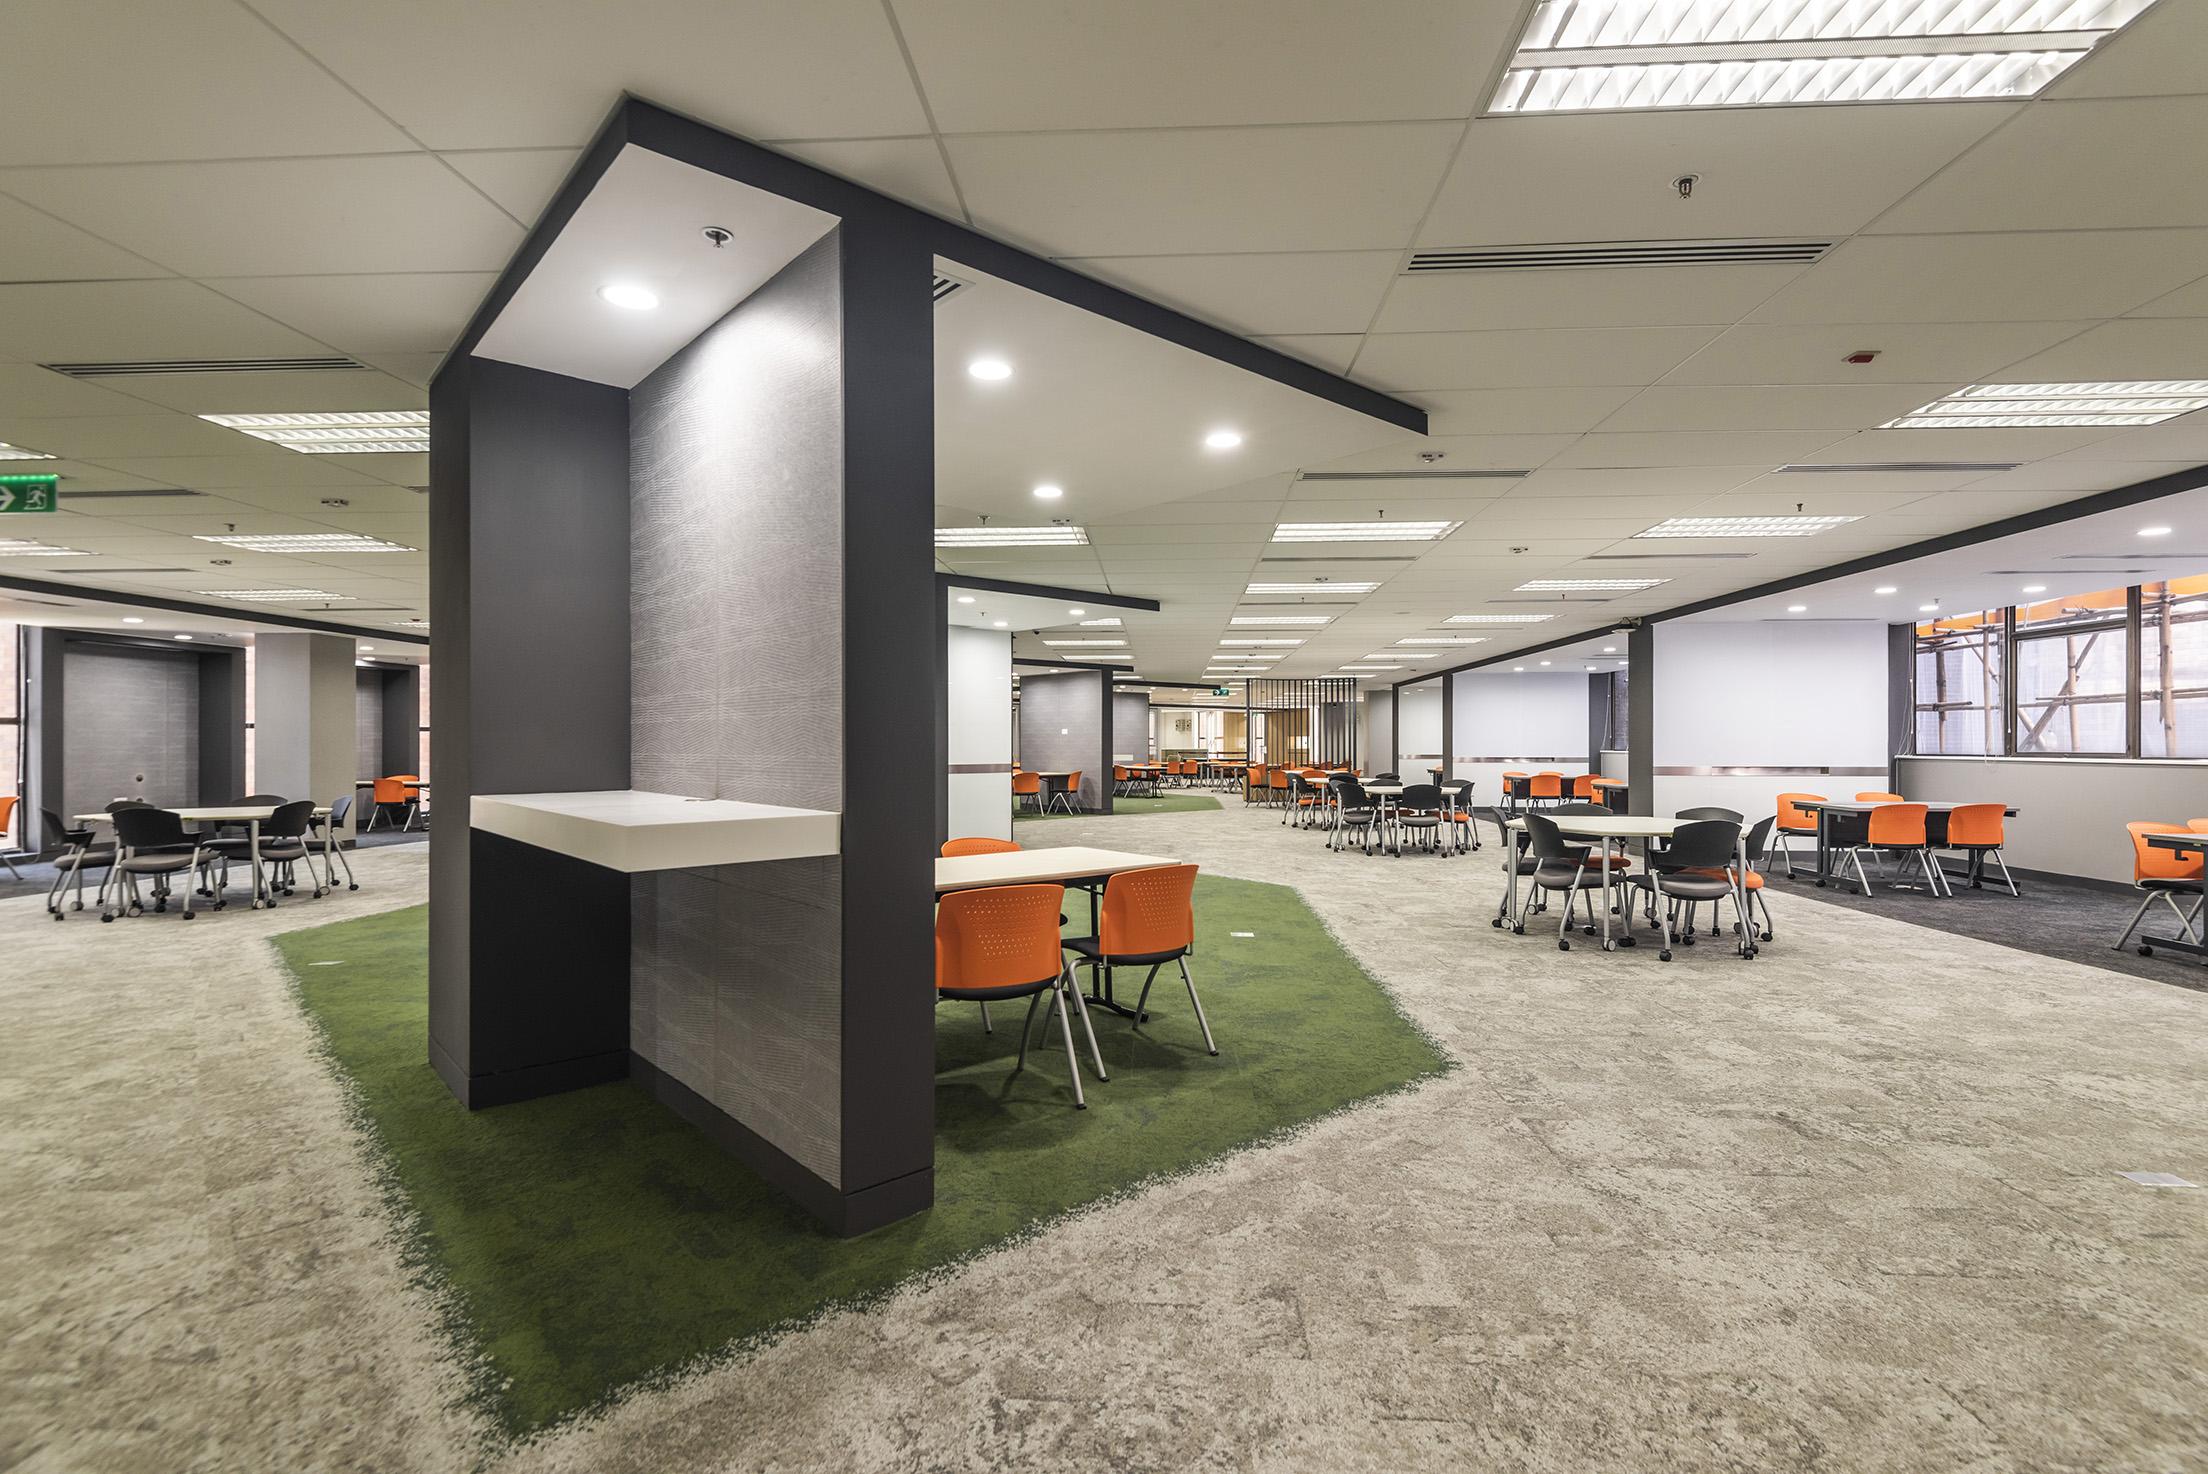 jeb_group-architecturalfinishes-echopanel-trapeze-poly-university-hk-01.jpg